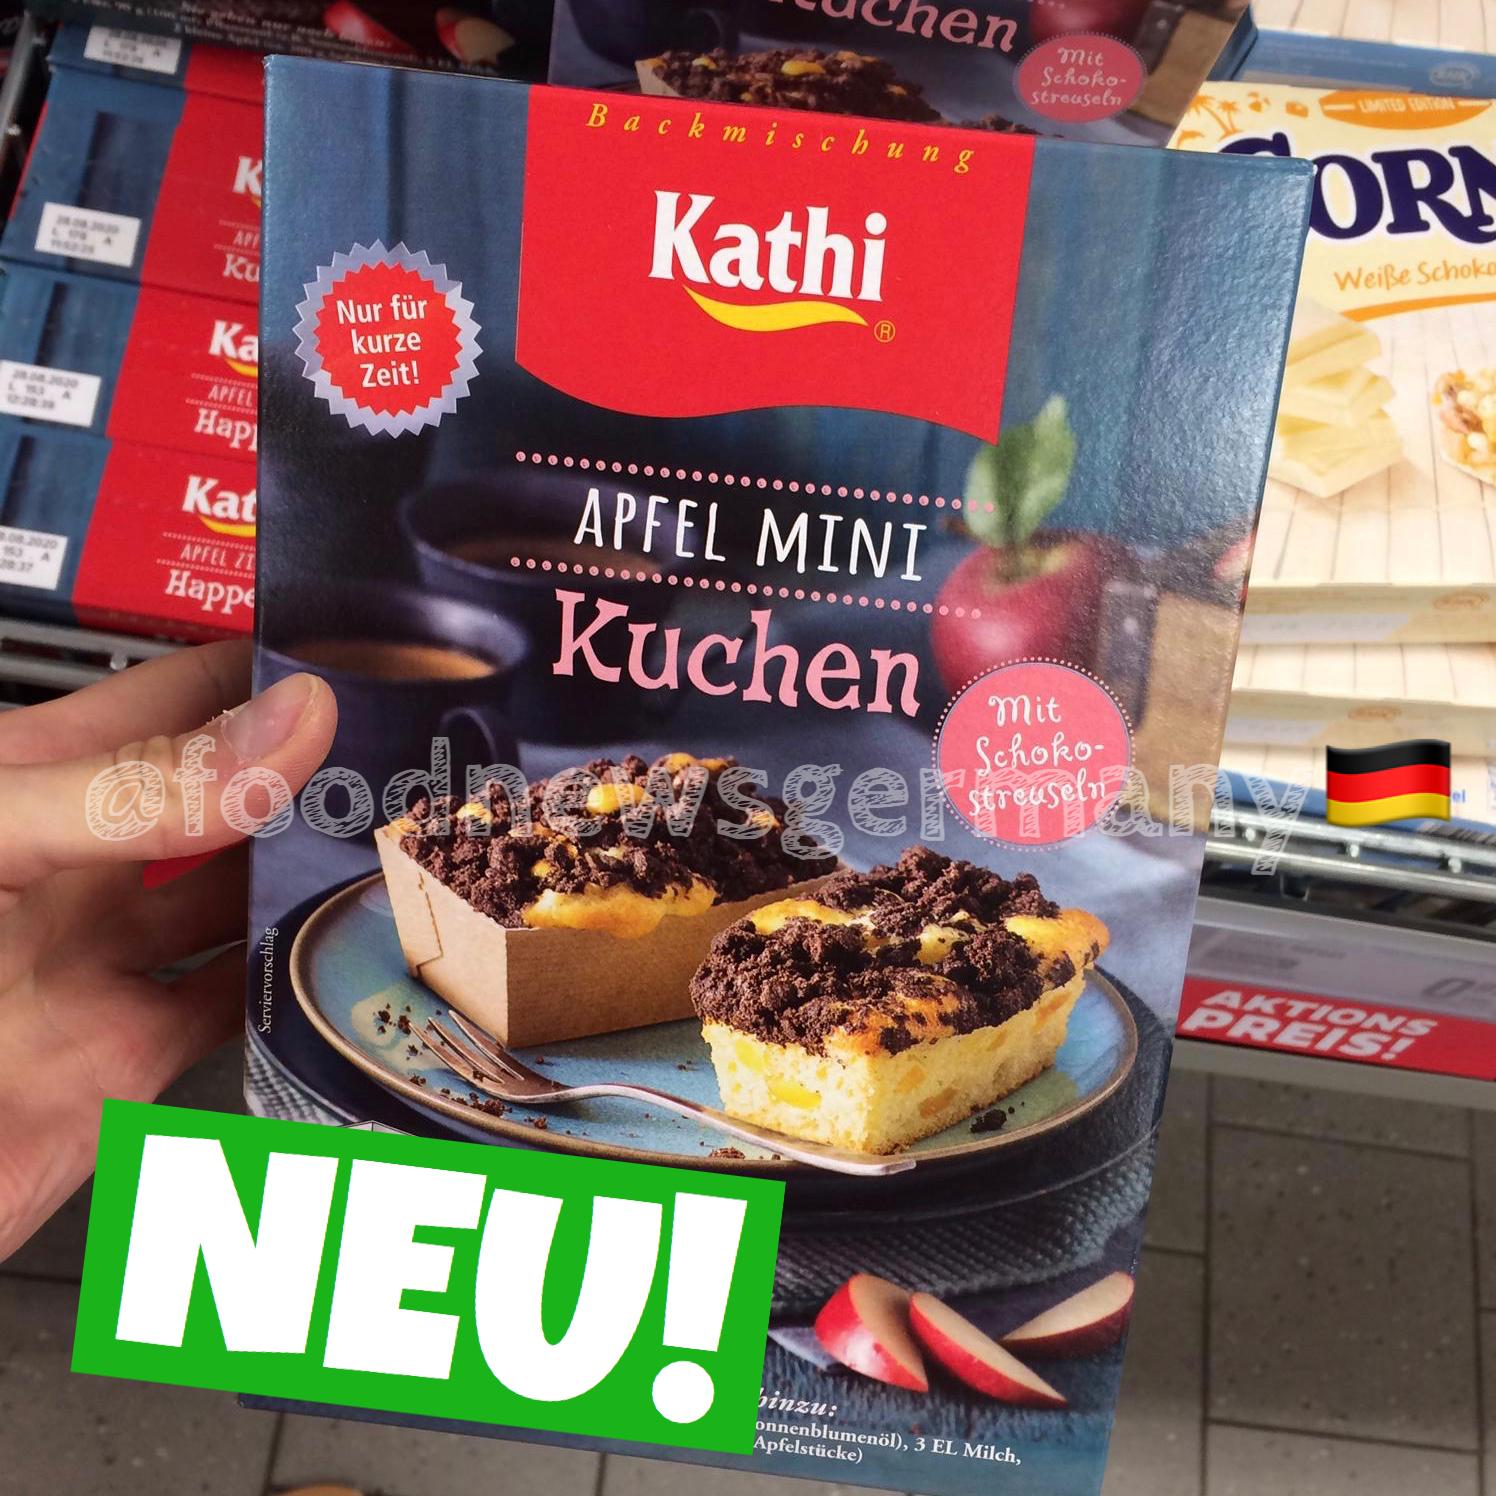 Kathi Apfel Mini Kuchen